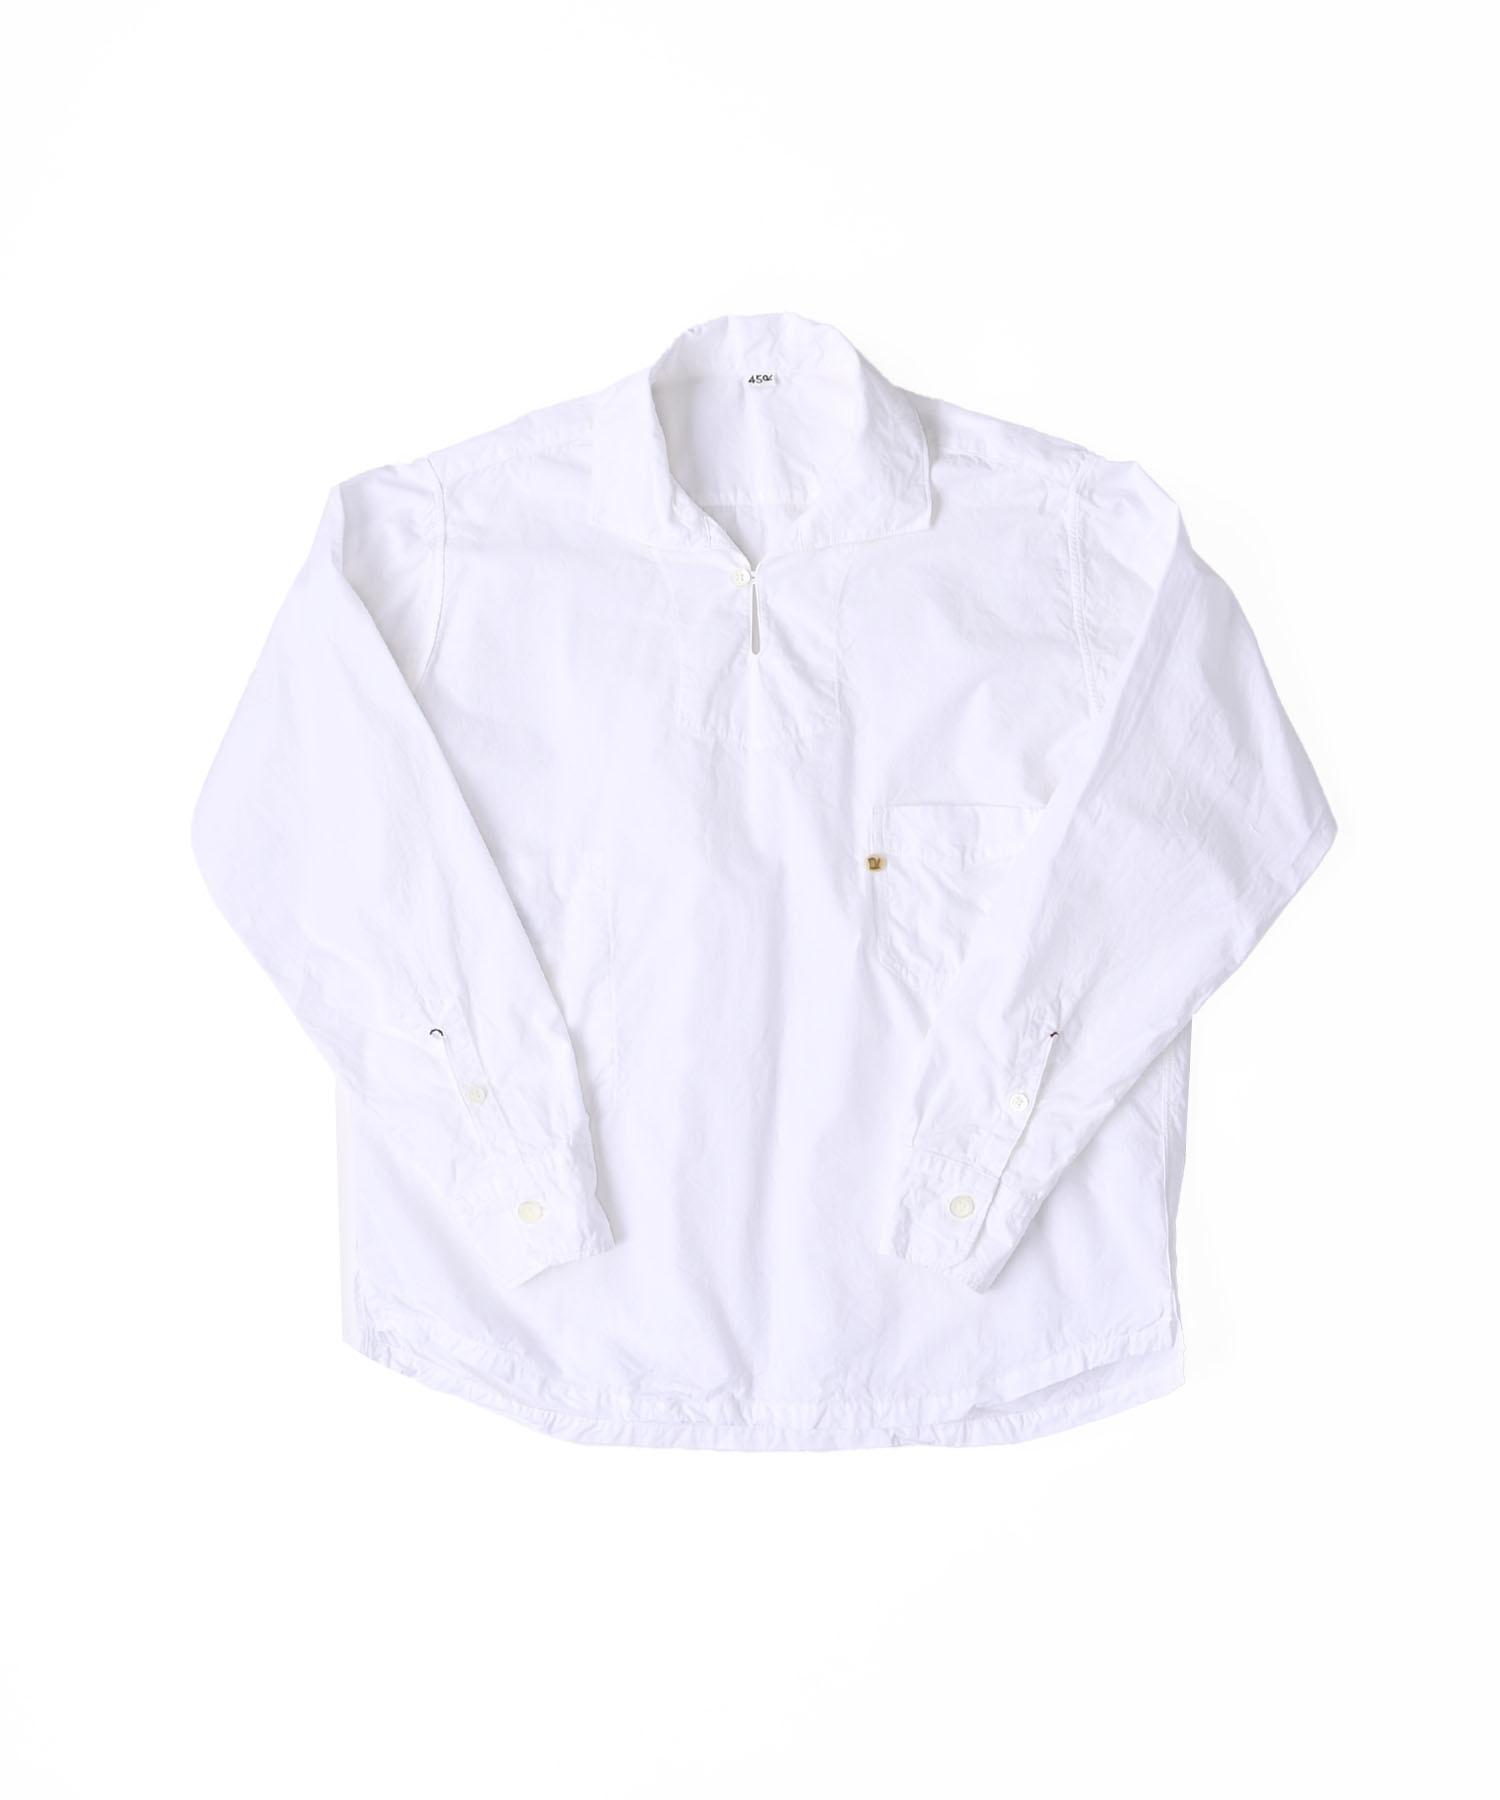 Damp Yarn Dyed 908 Ocean Pullover Shirt (0421)-8